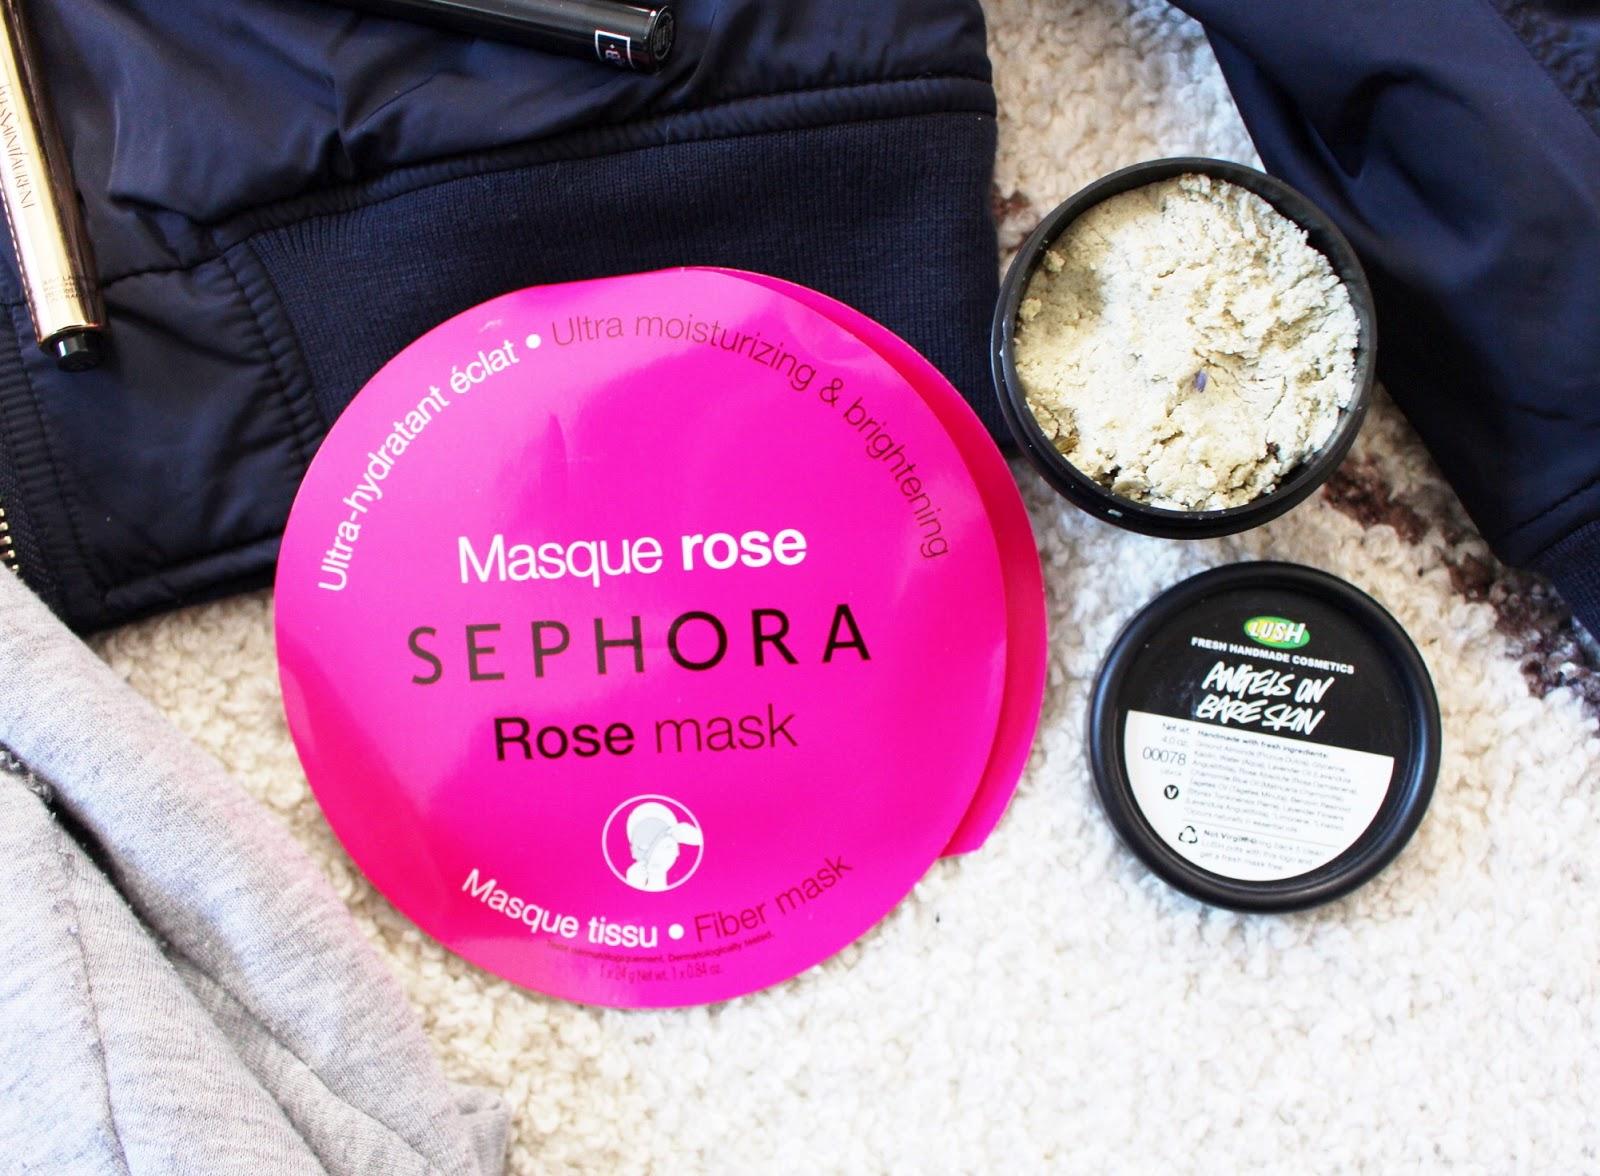 sephora rose sheet mask, lush angels on bare skin cleanser